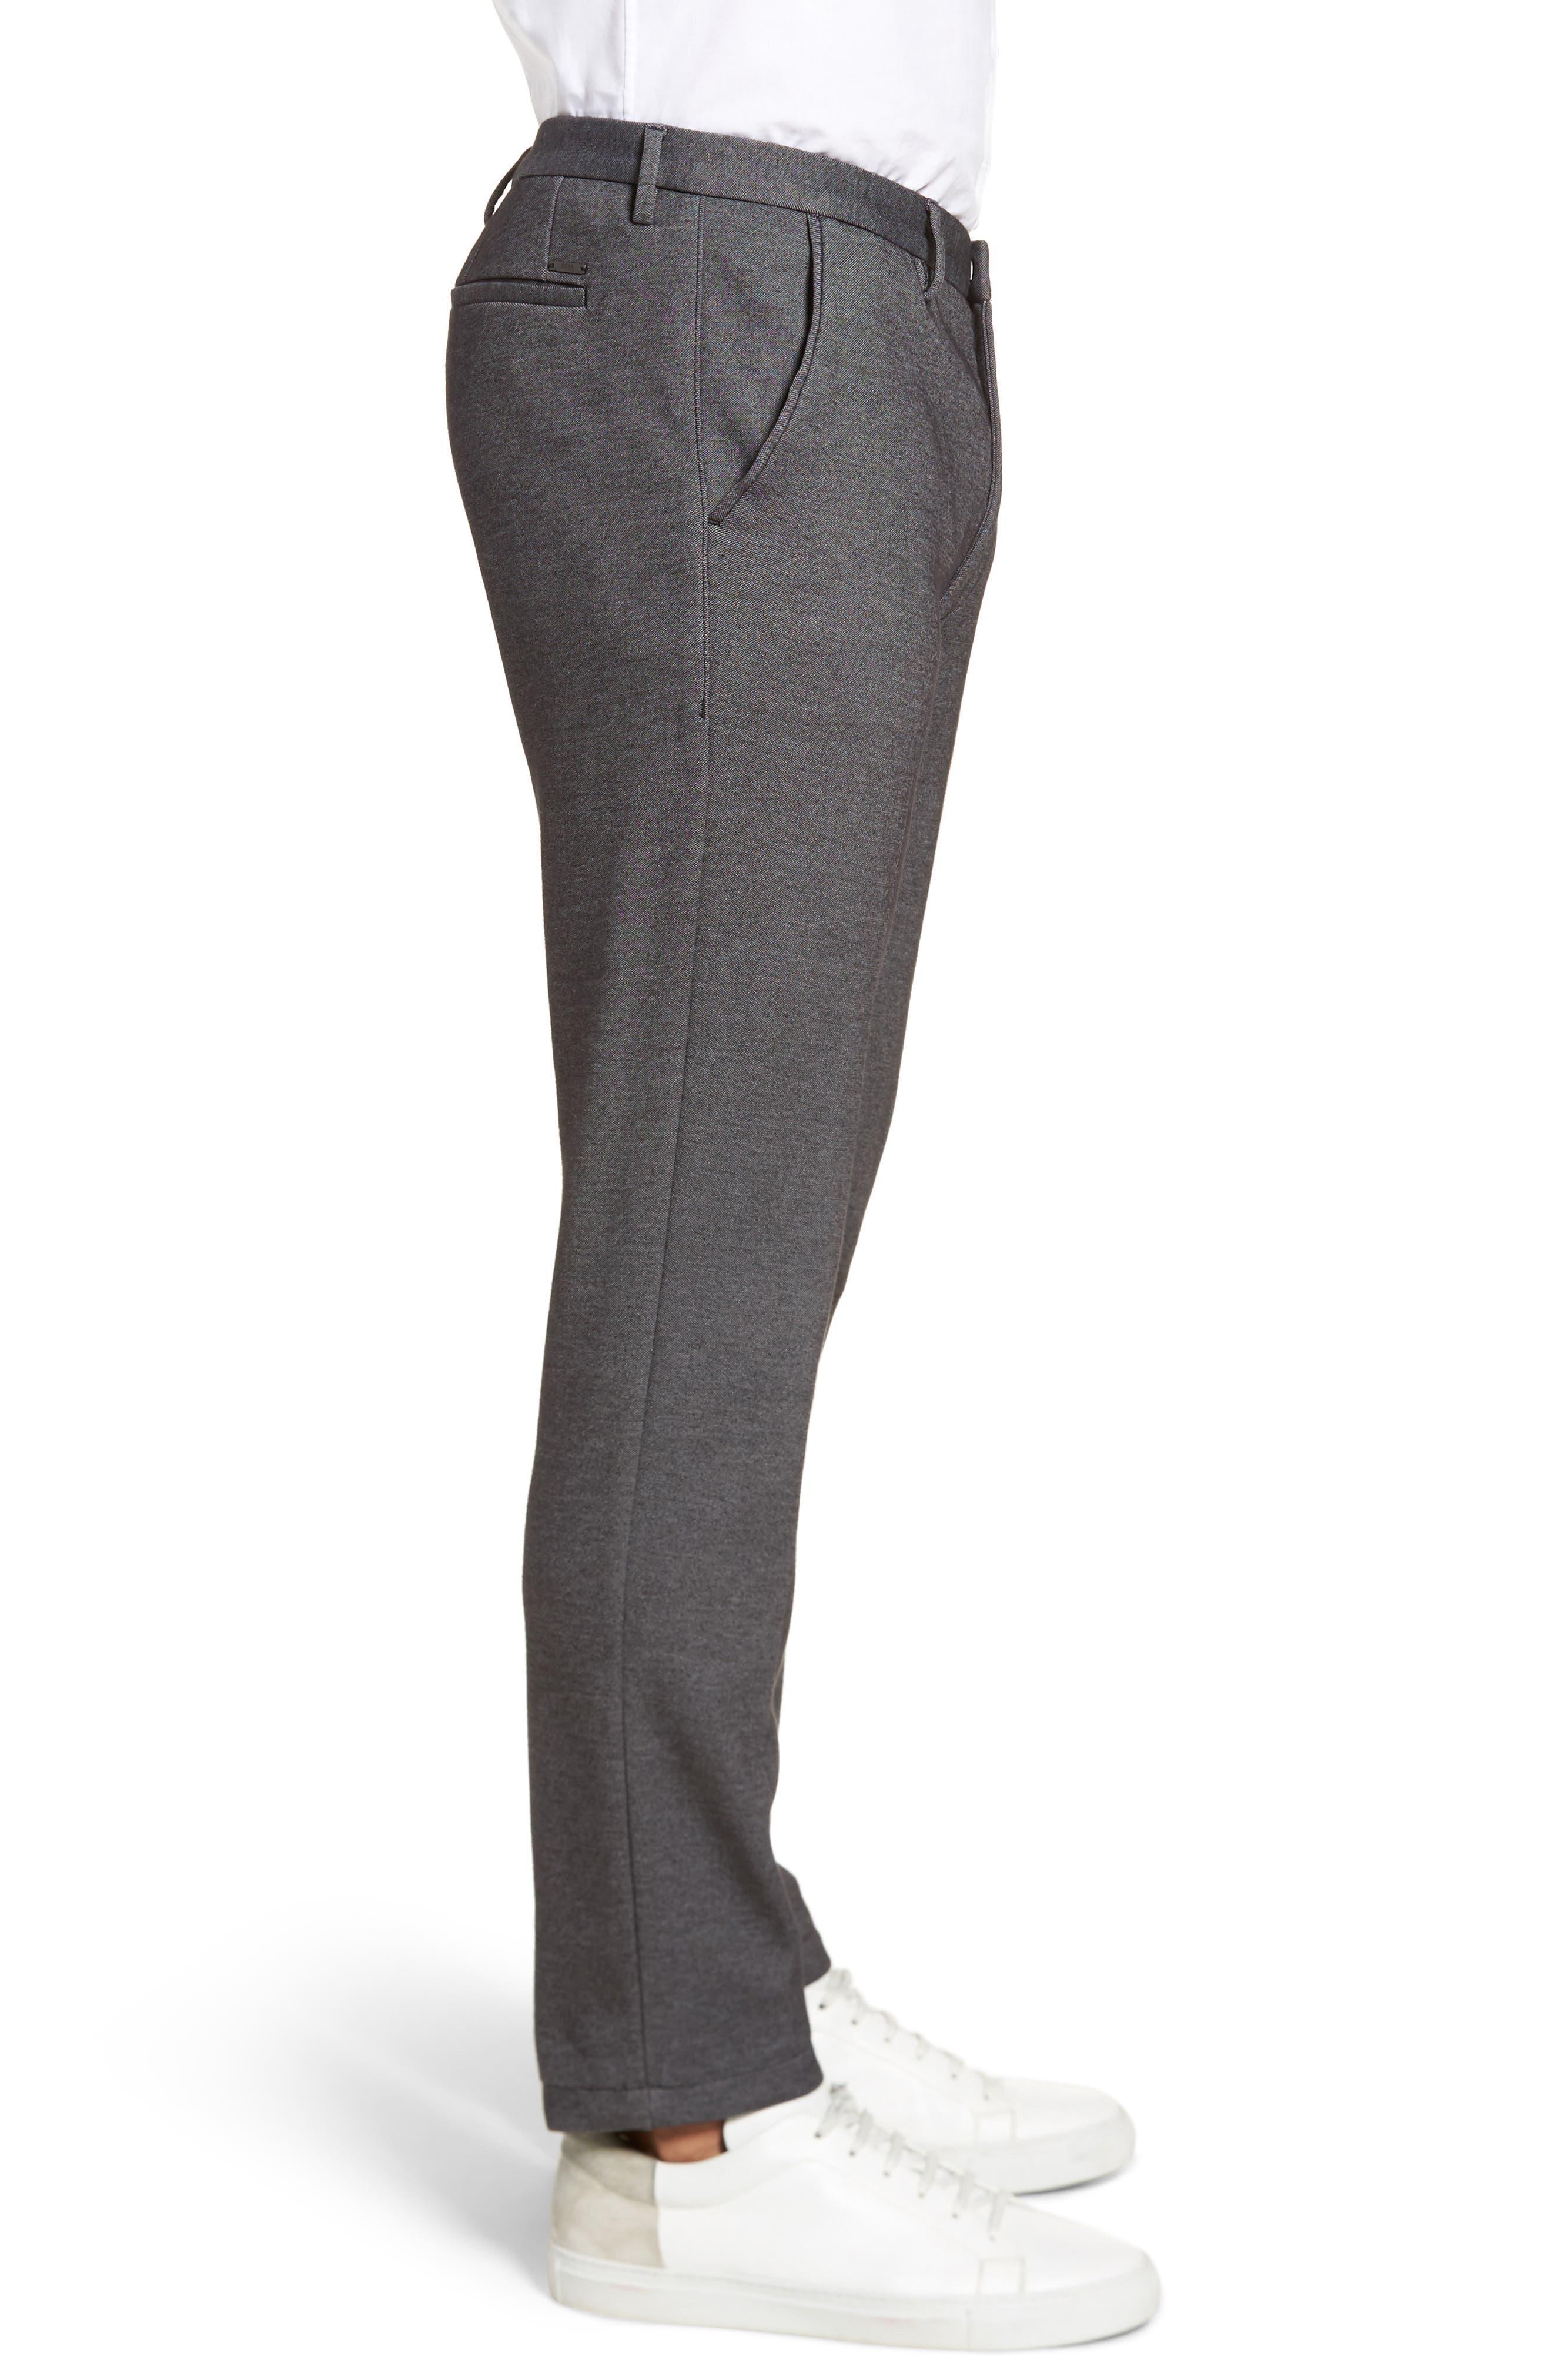 Kaito Melange Cotton Blend Pants,                             Alternate thumbnail 3, color,                             030